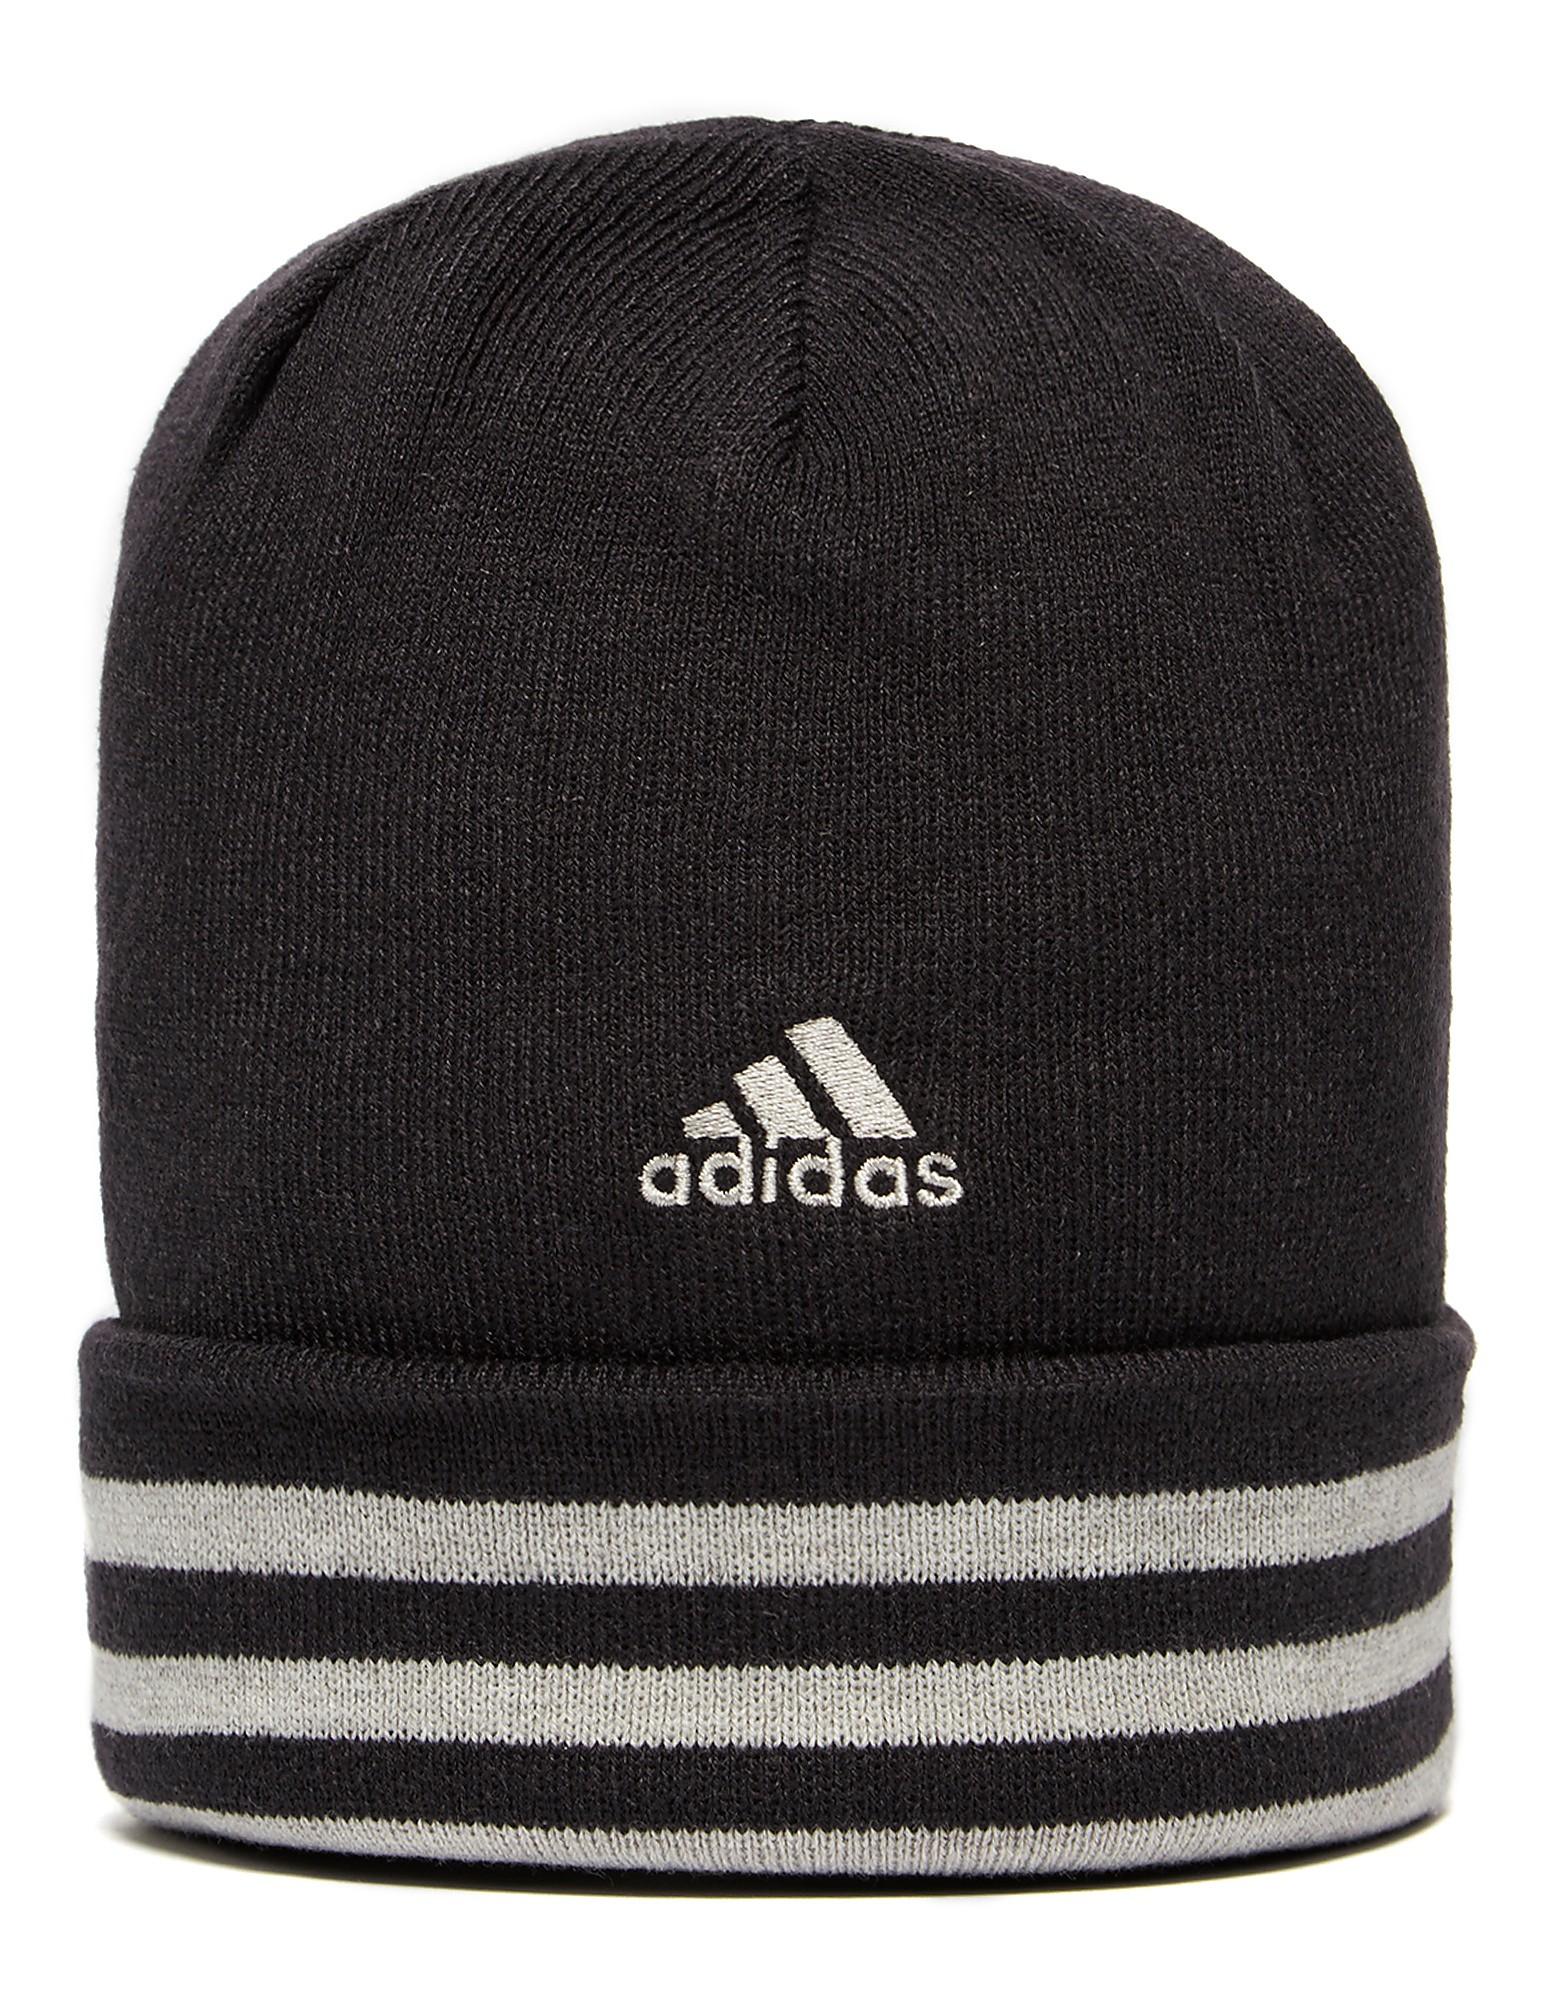 cc6407f3415 coupon adidas essential 3 stripe beanie hat black white mens 5d7ce 692fd